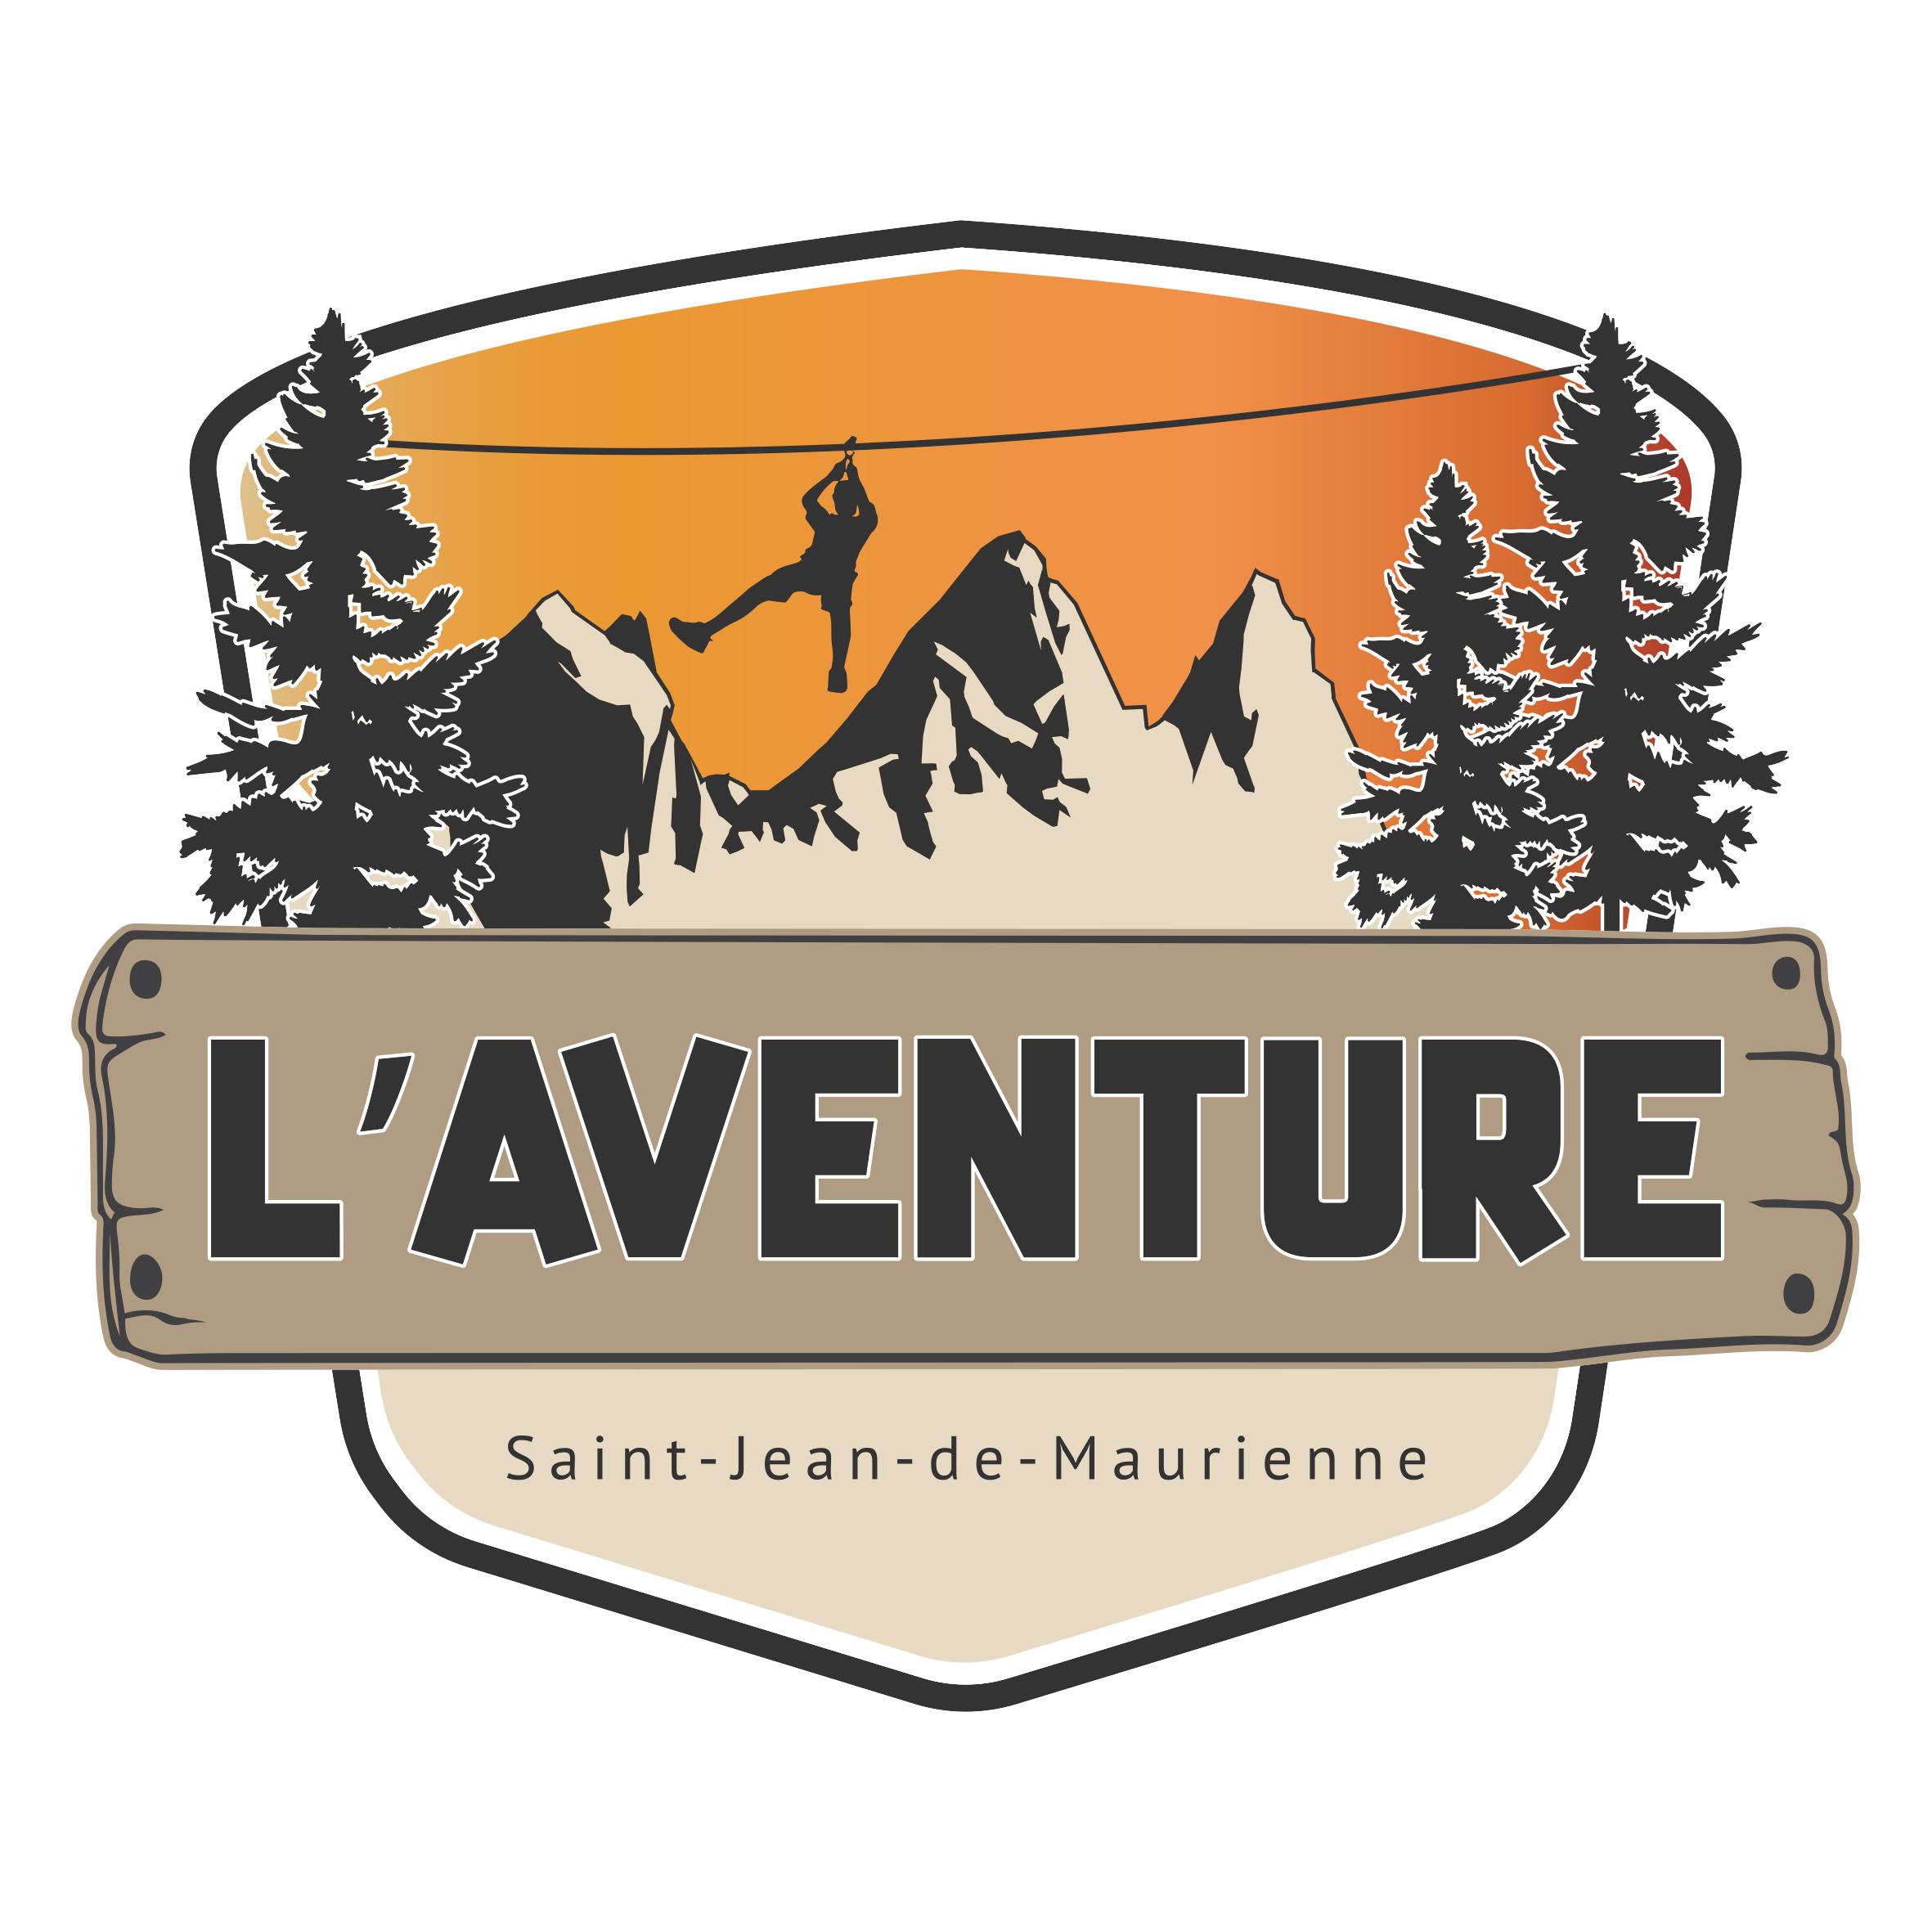 logo L'aventure fond blanc